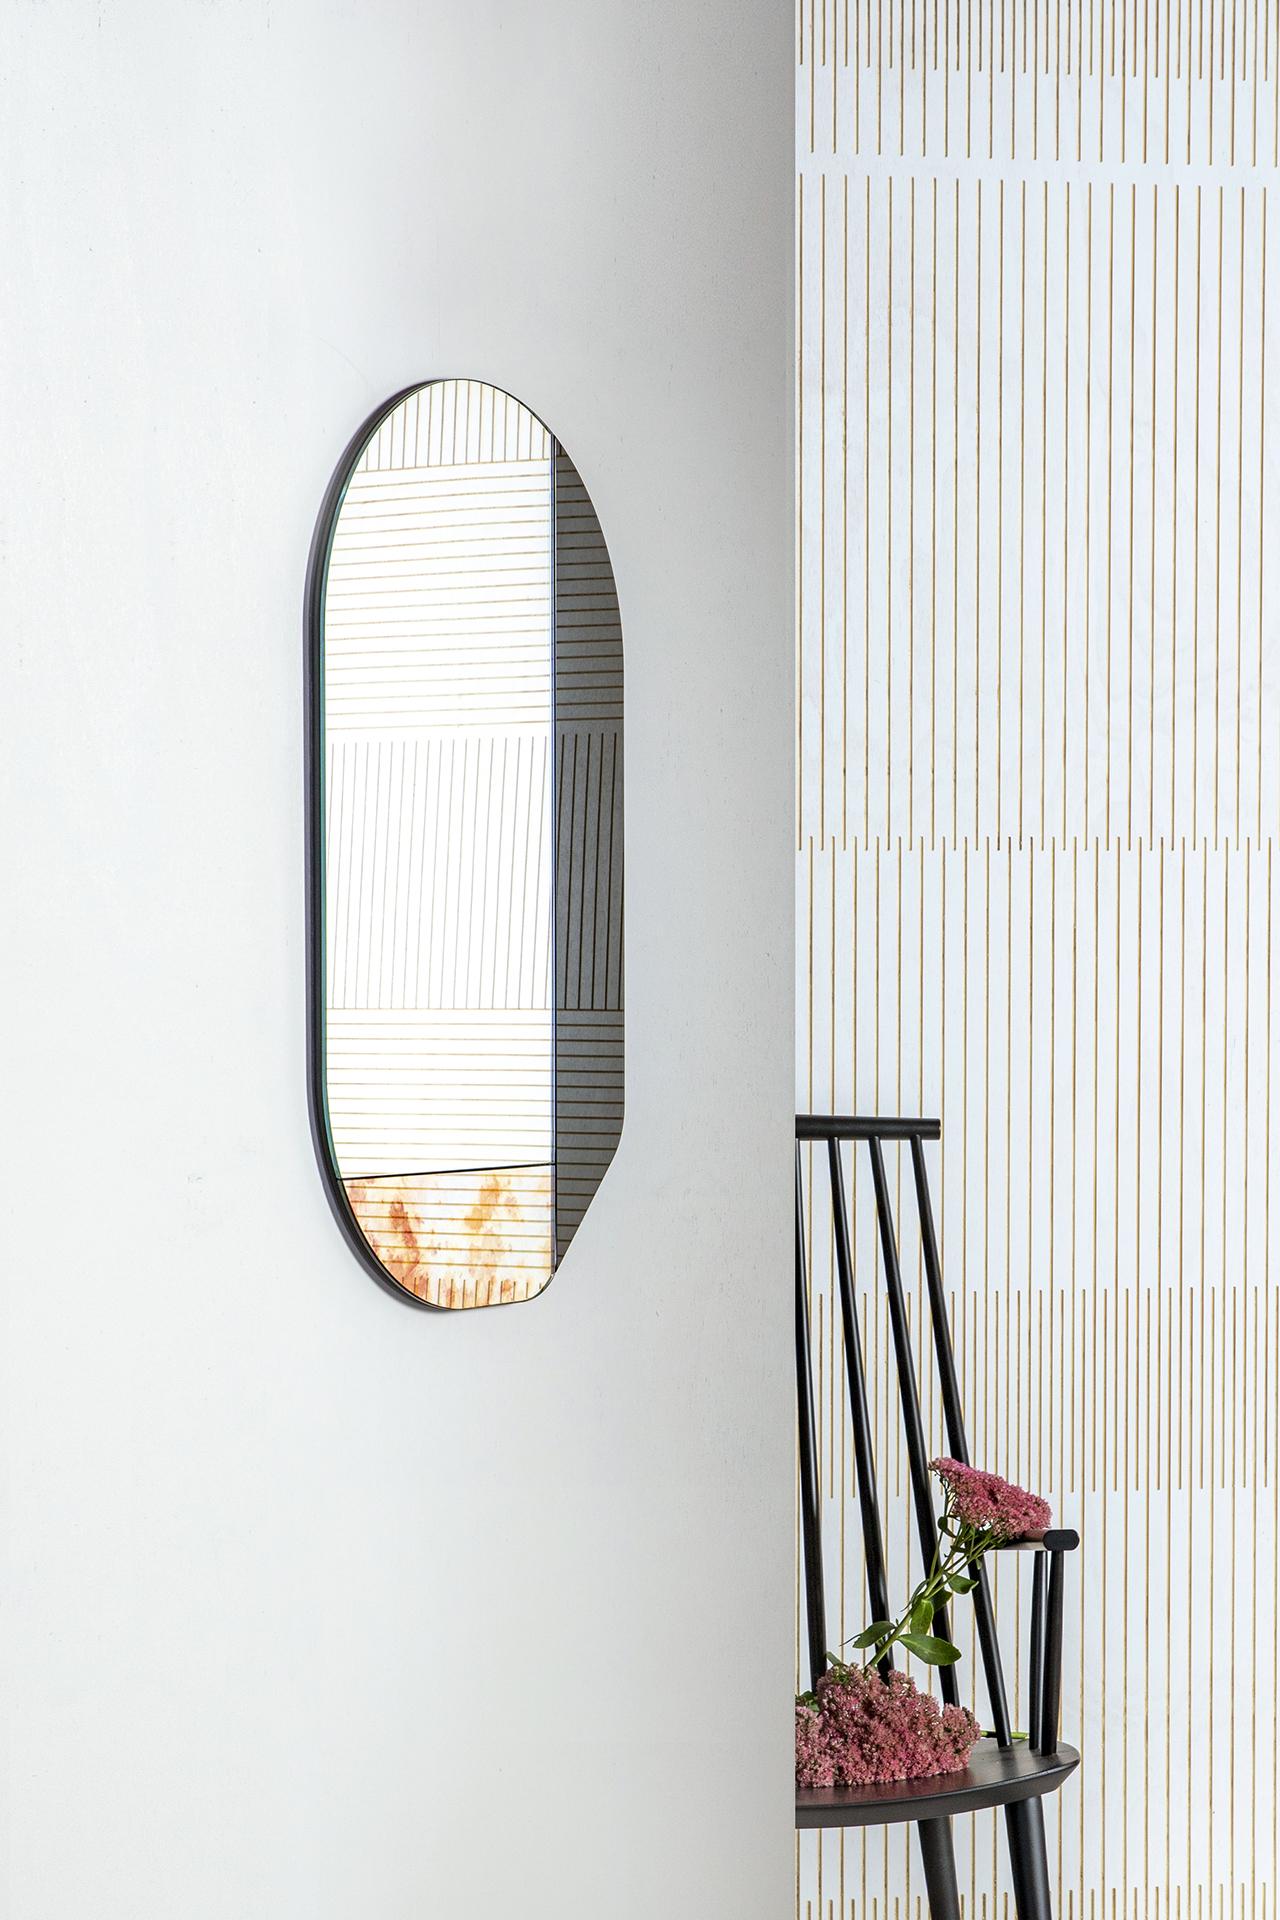 mirror on wall